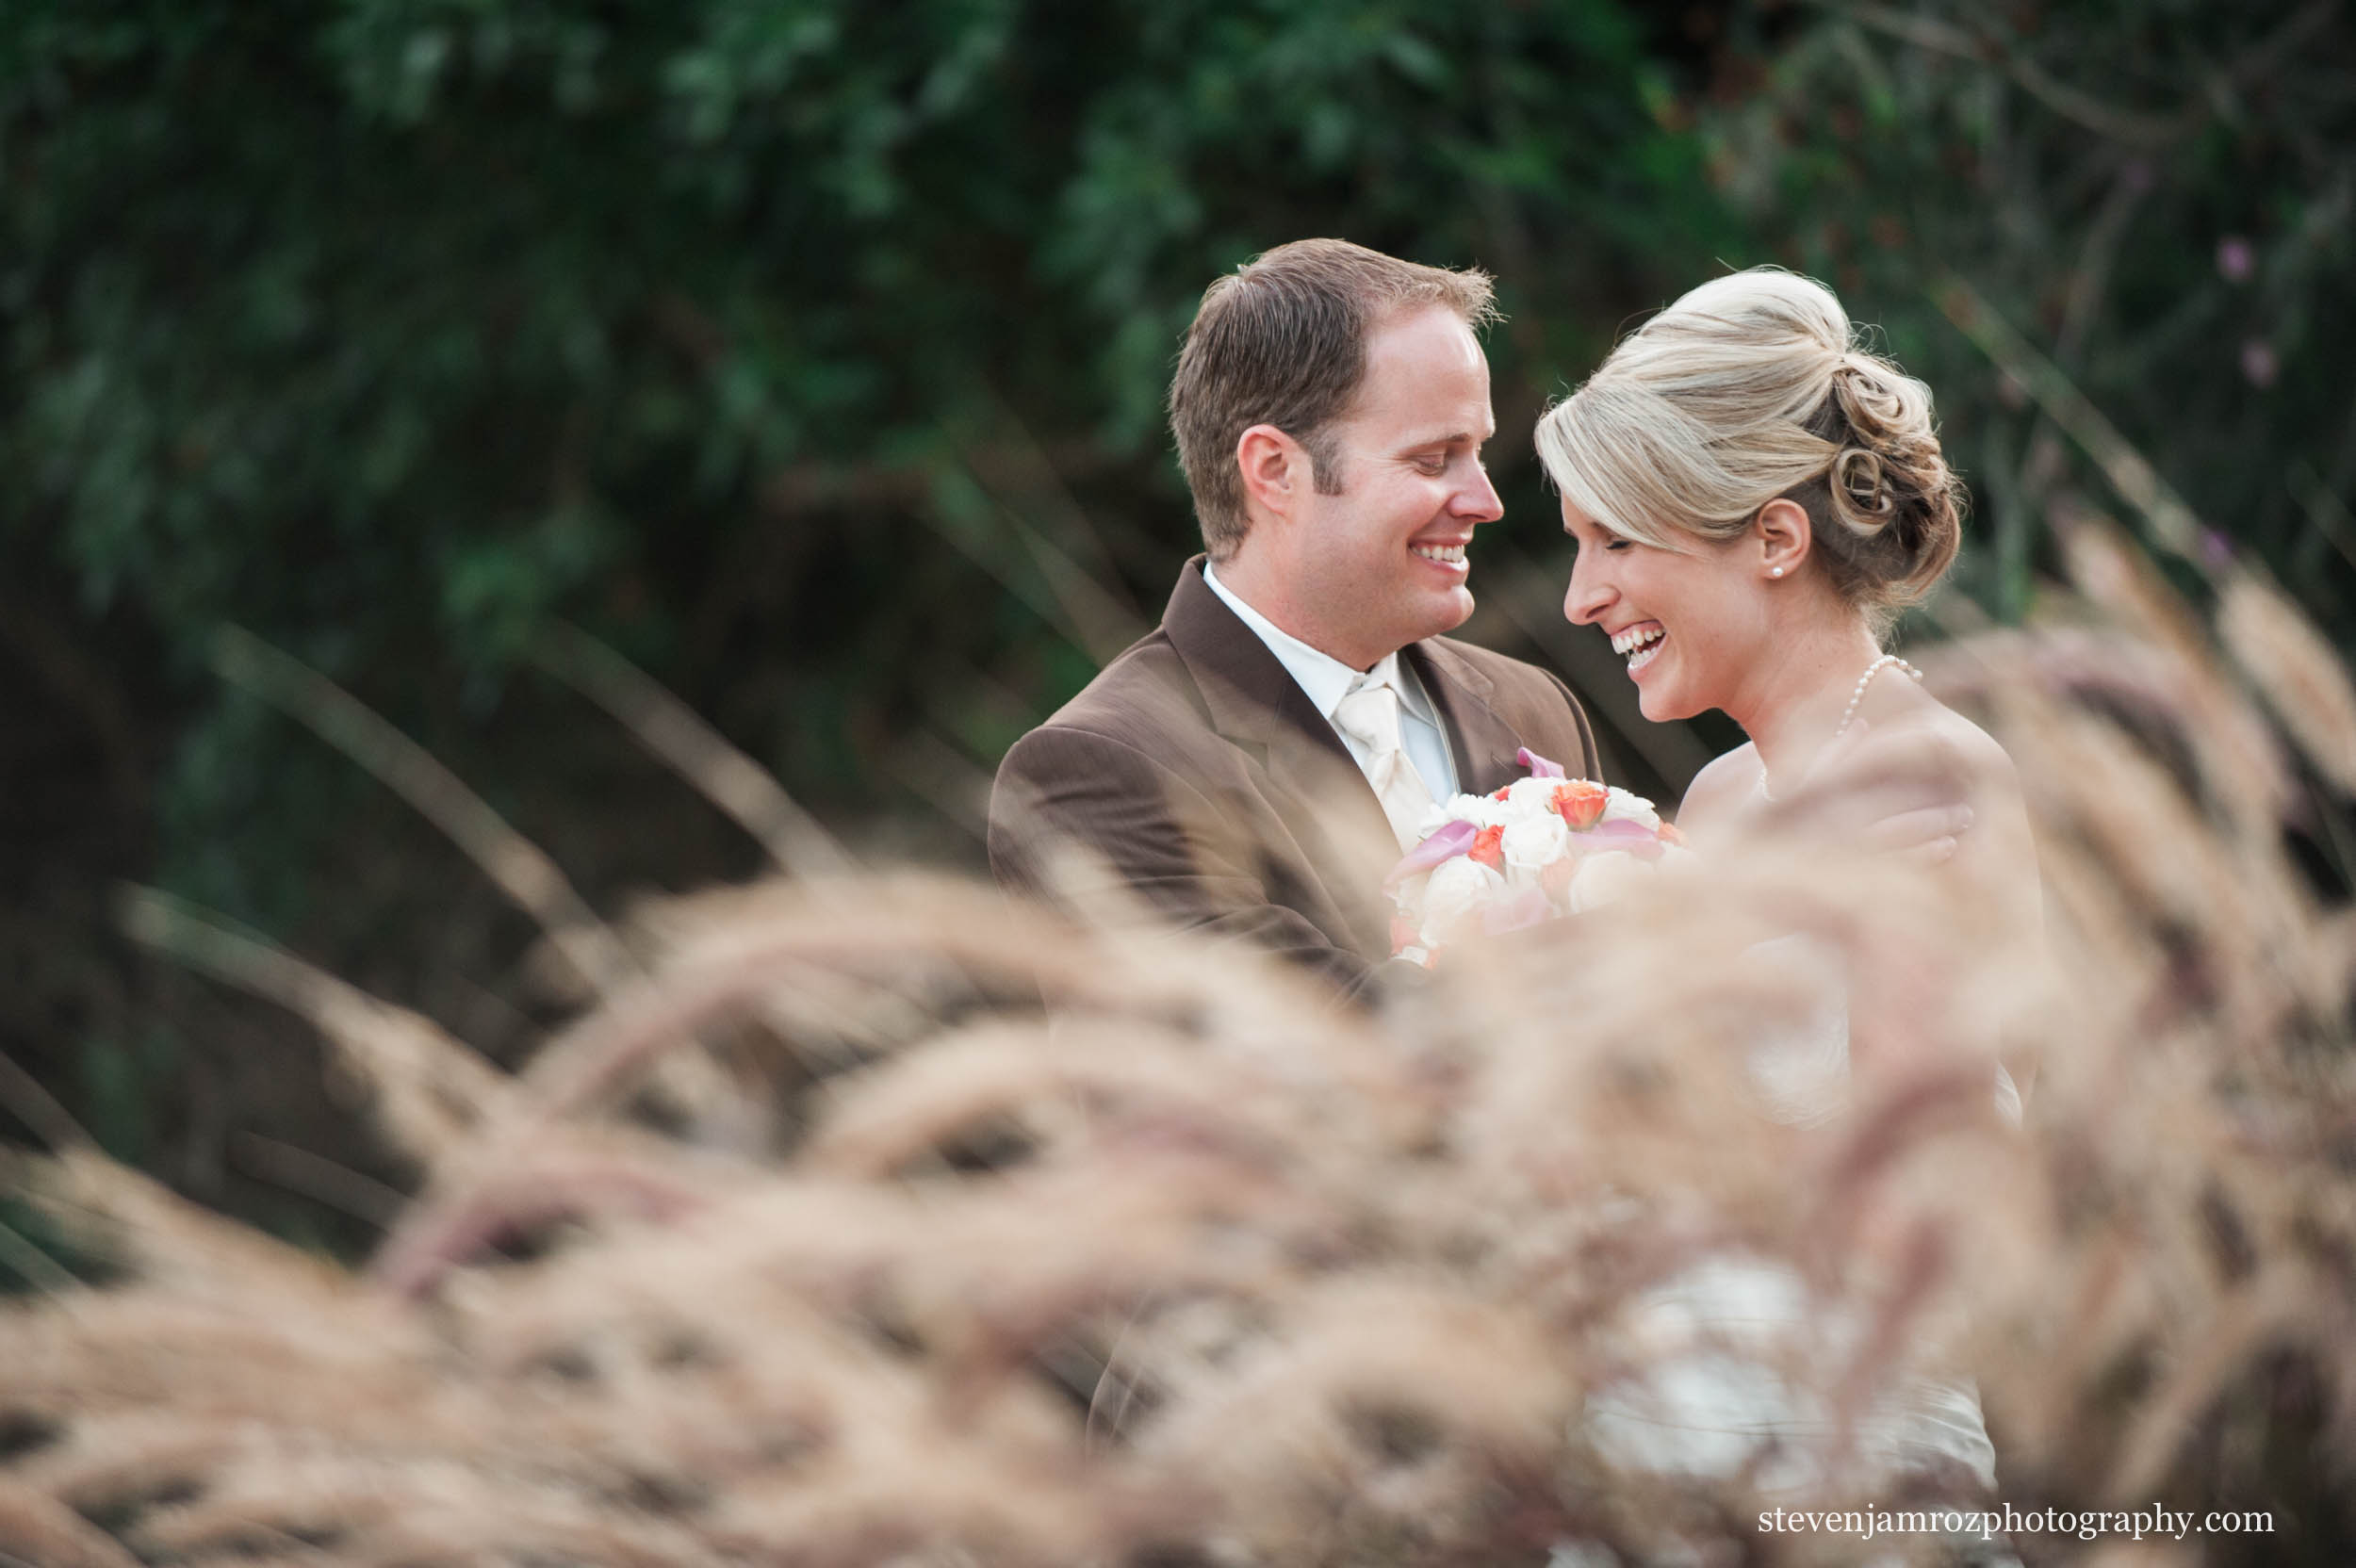 bride-groom-outdoor-portraits-chapel-hill-steven-jamroz-photography-0069.jpg